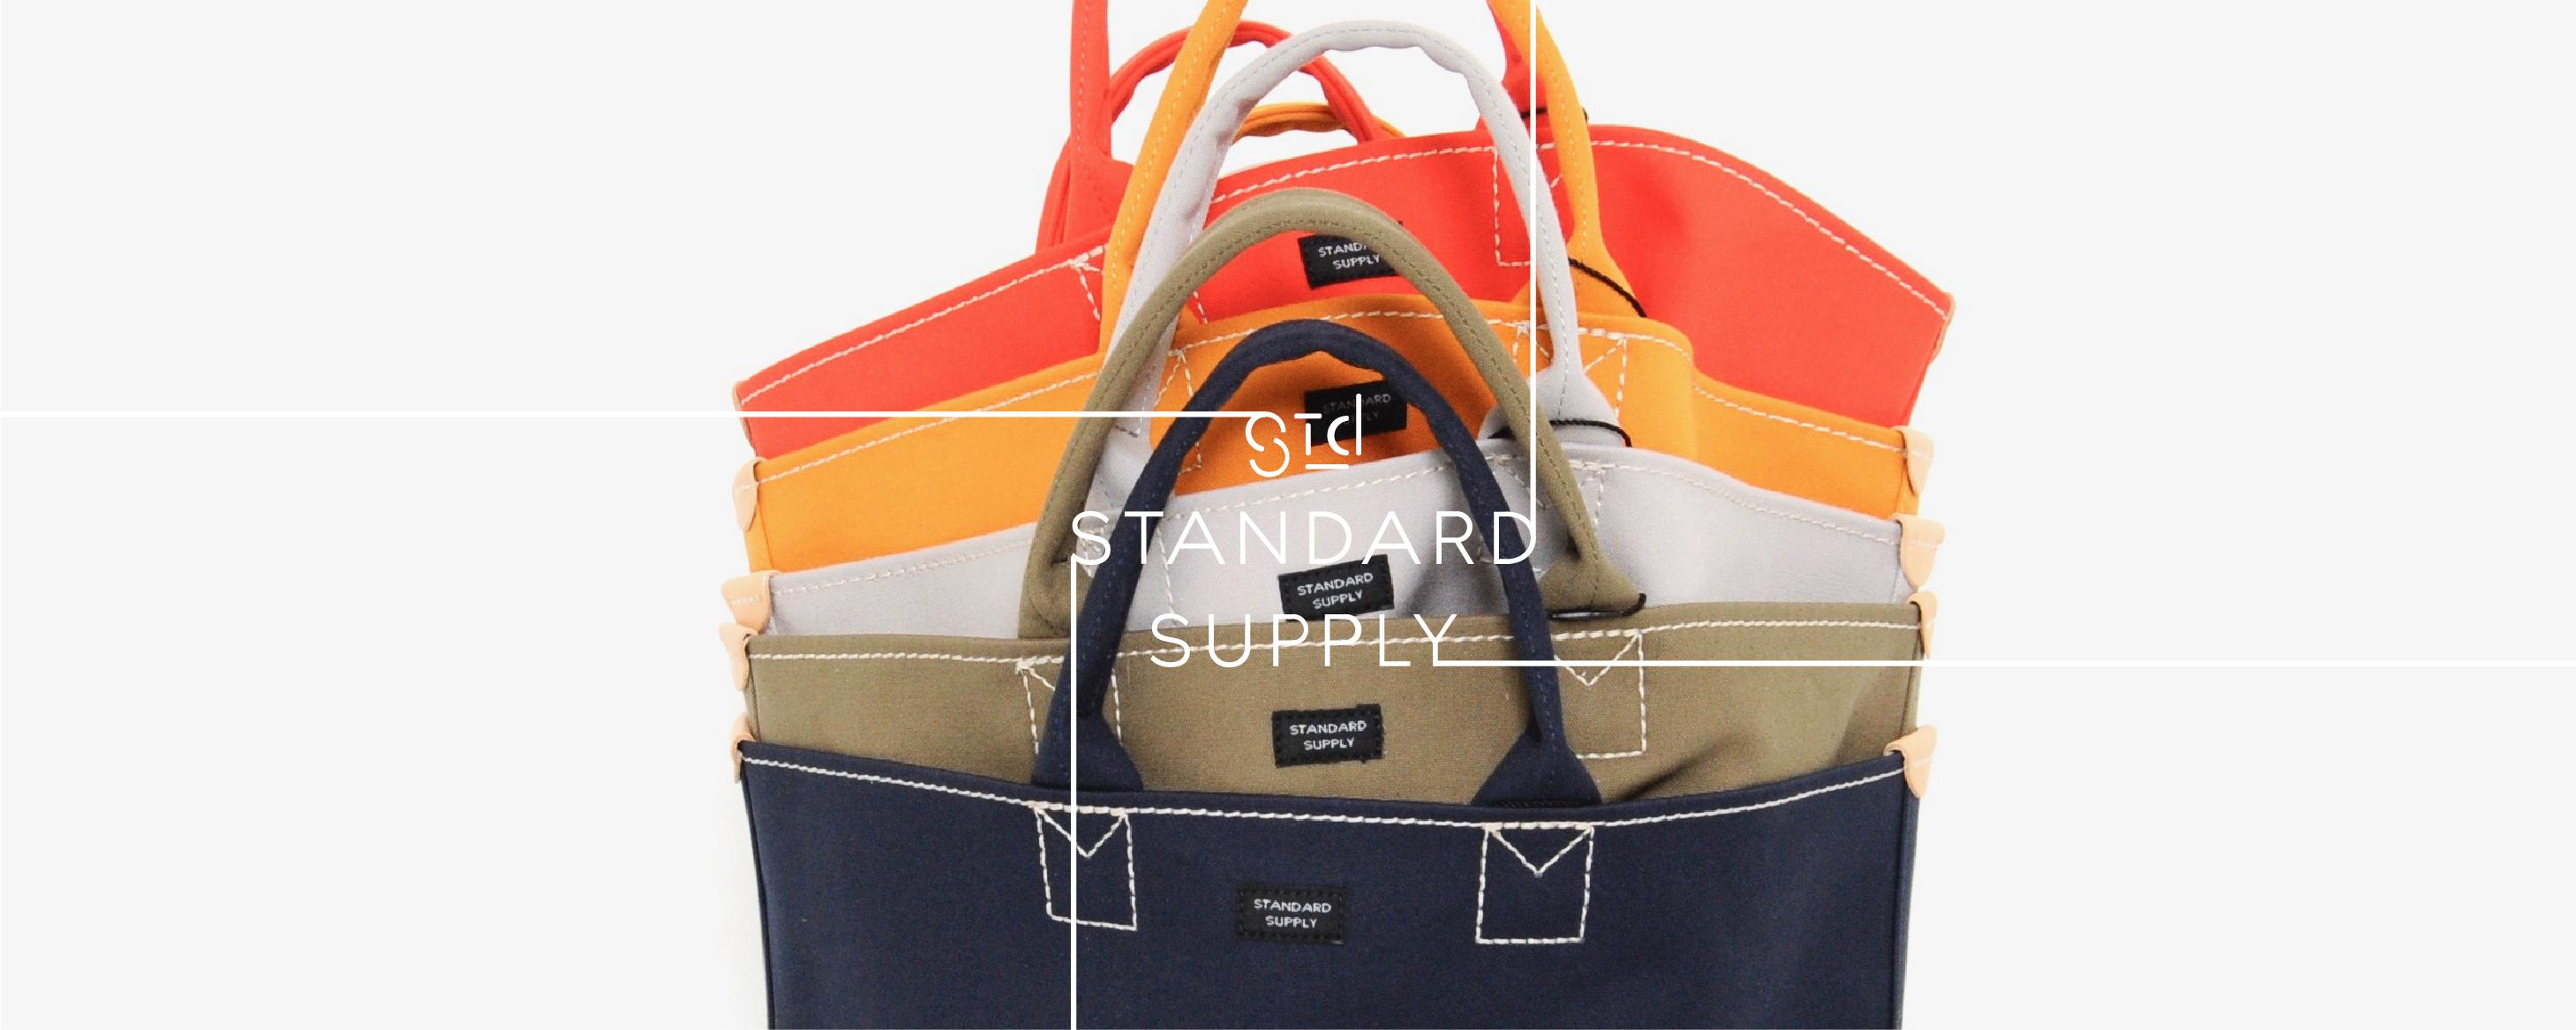 bn_standard supply-01.jpg